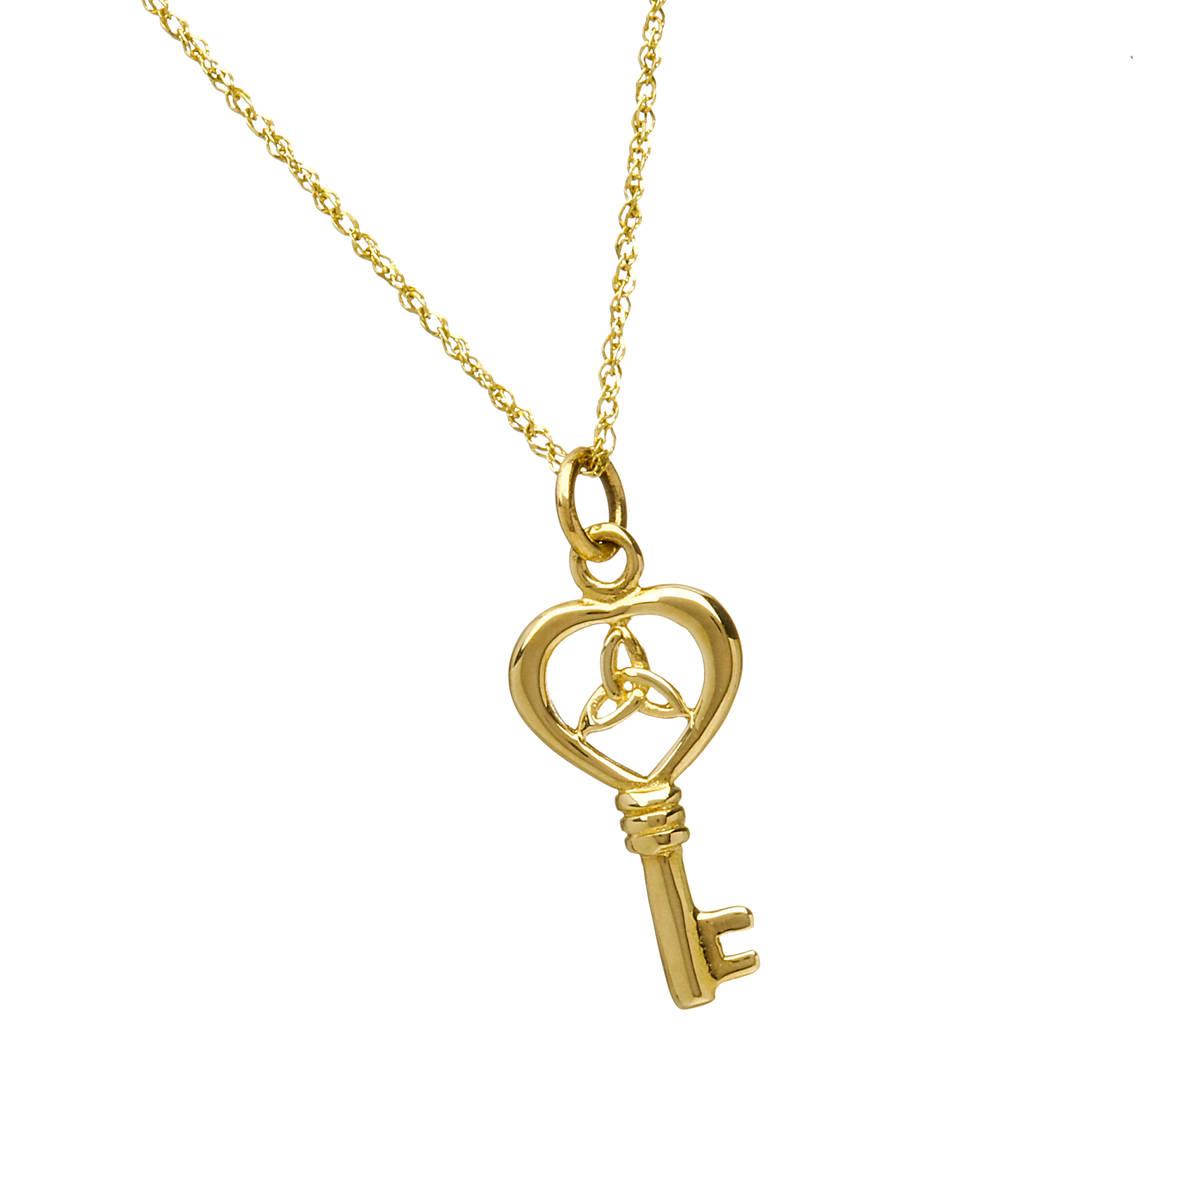 10 carat yellow gold key pendant with trinity knot